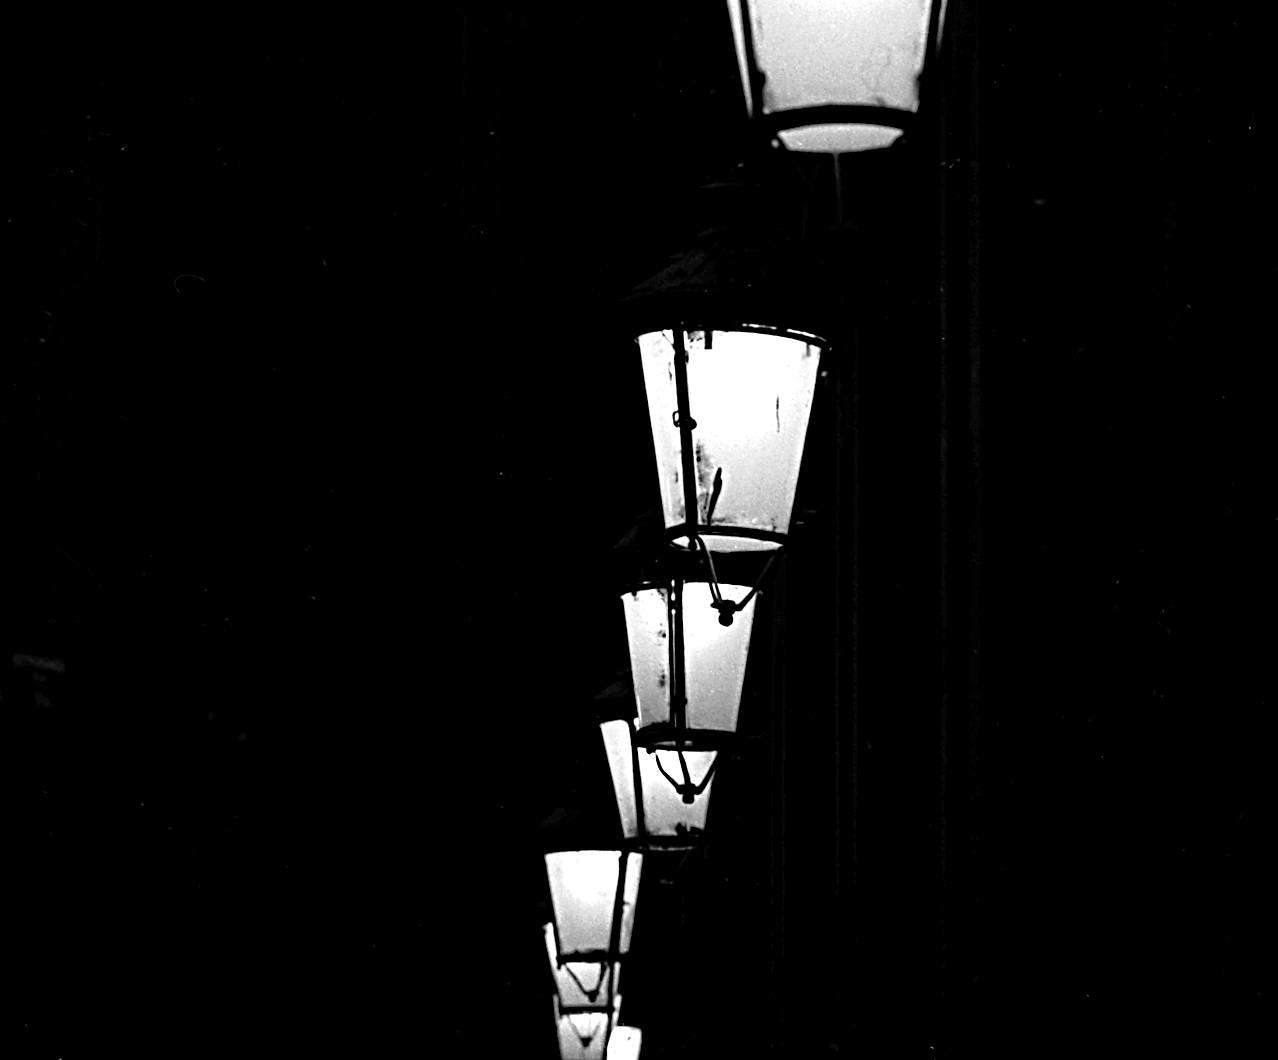 Plaça Reial, Barcelona - minimalismcontest - andrewld | ello